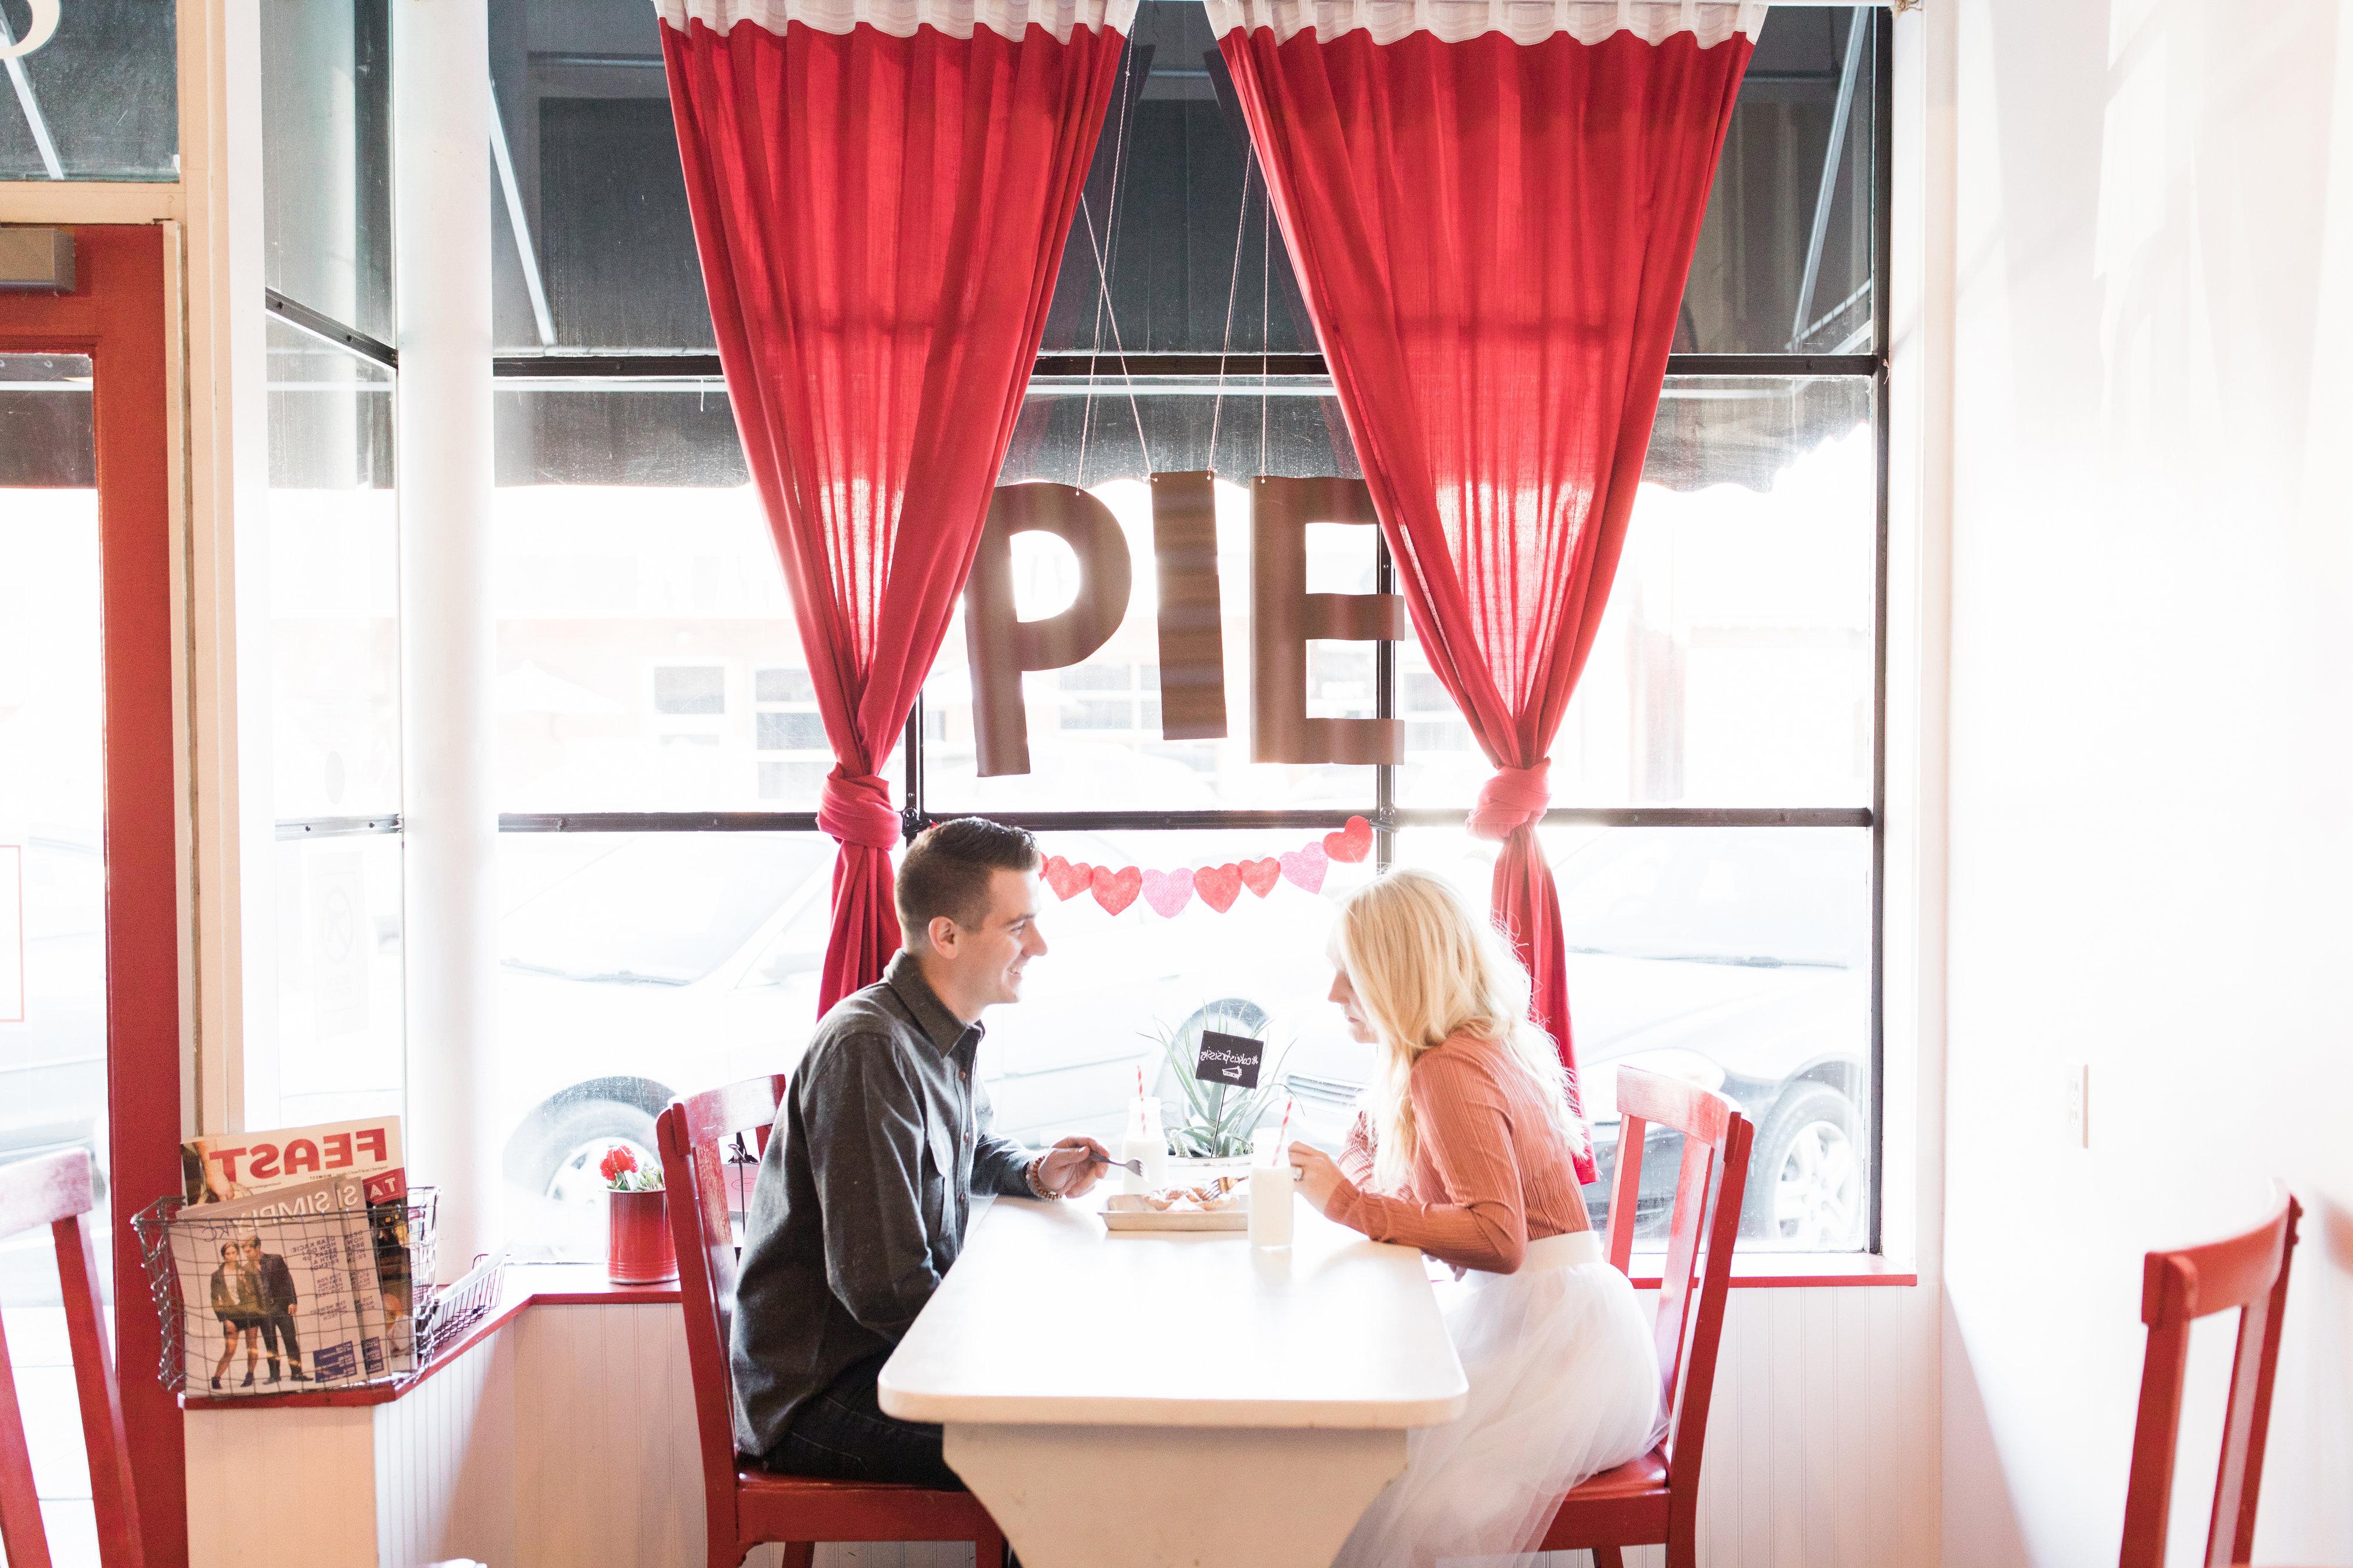 Pie Date